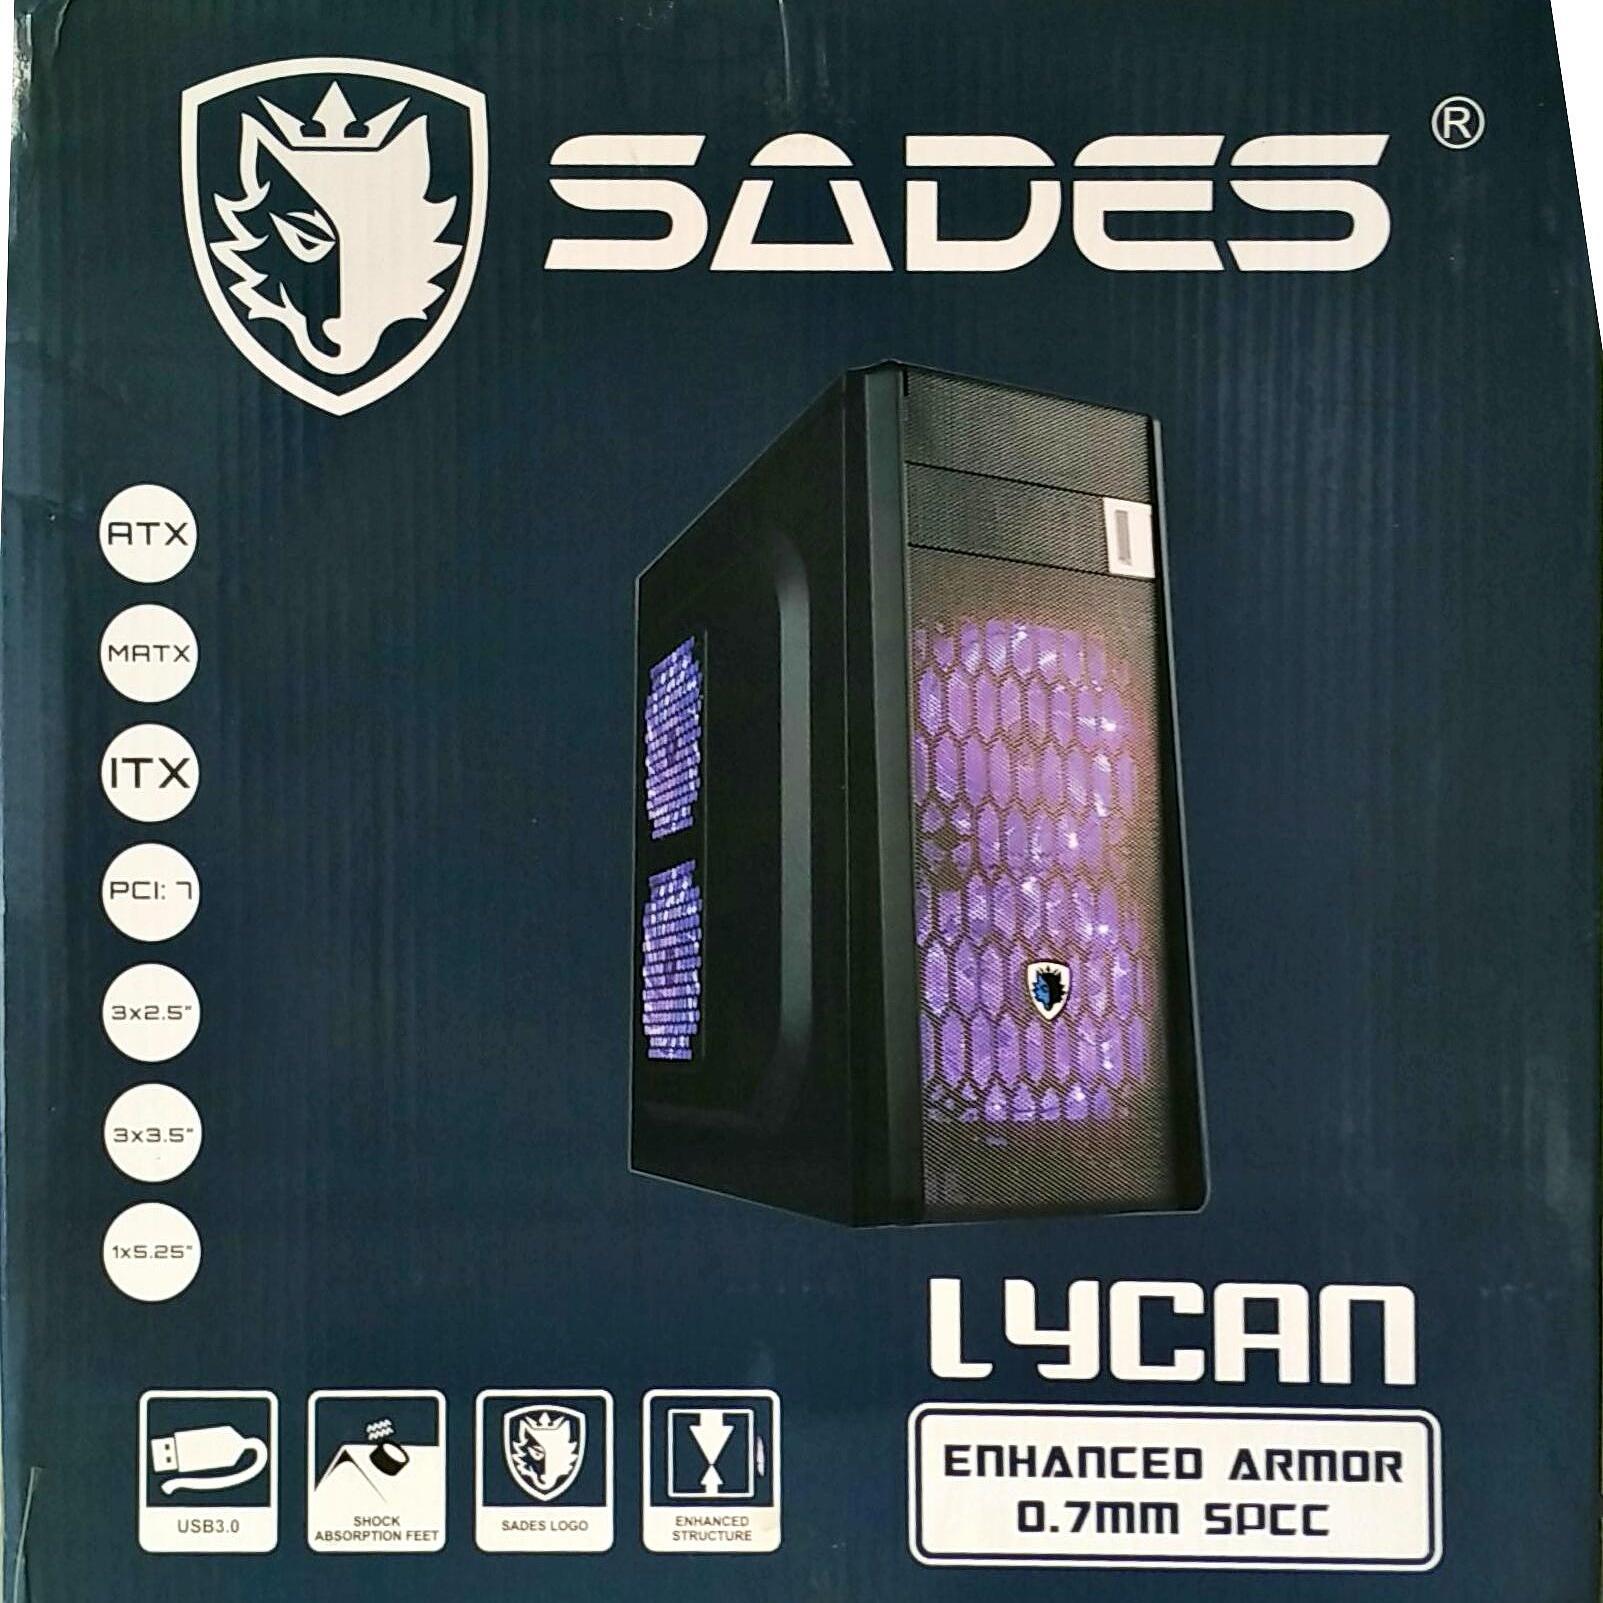 Casing Sades Lycan